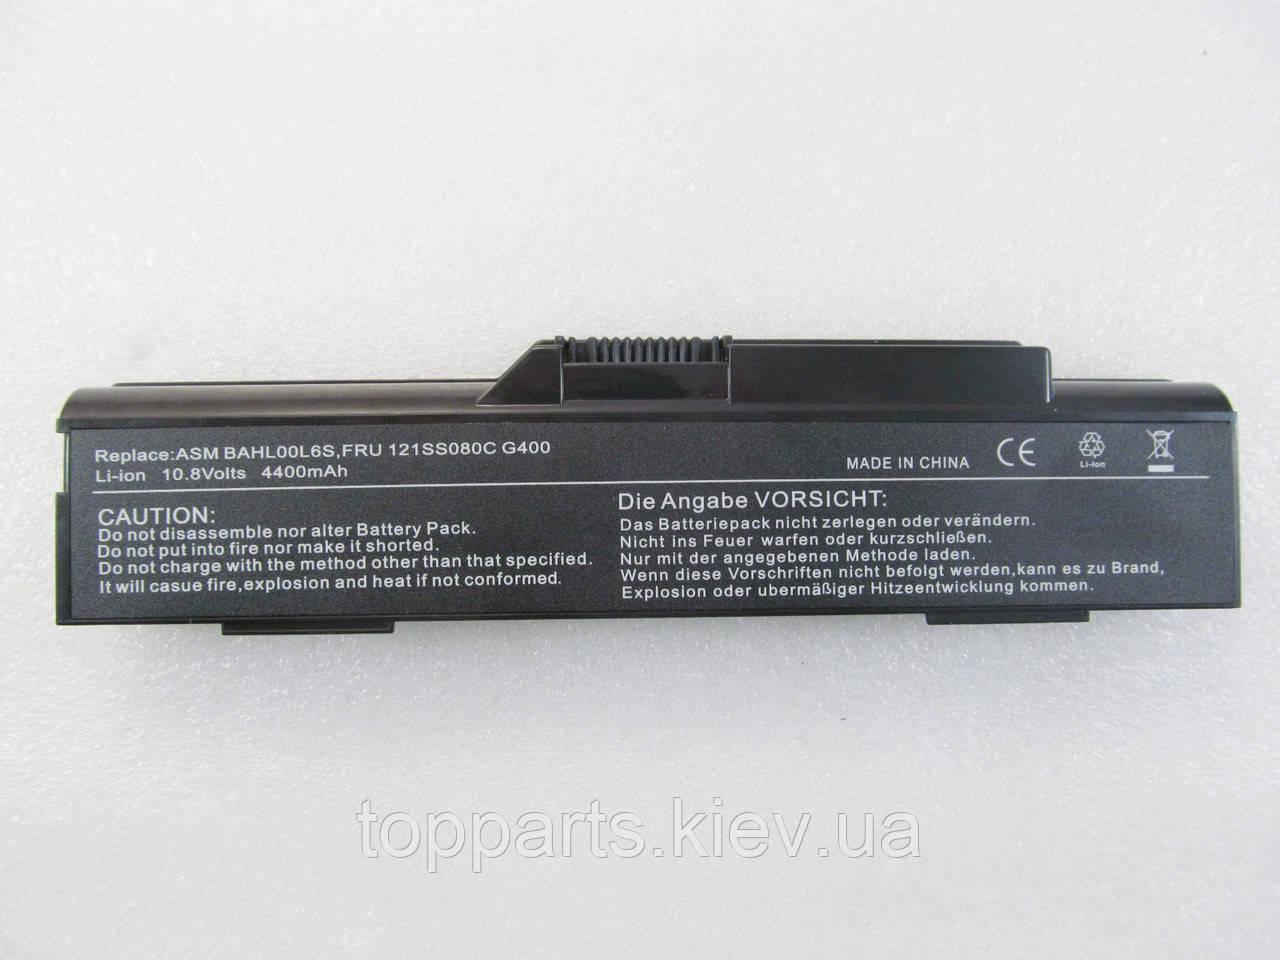 Lenovo IdeaPad G400, 4400mAh, 6cell, 11.1V, Li-ion, черная, УЦЕНКА